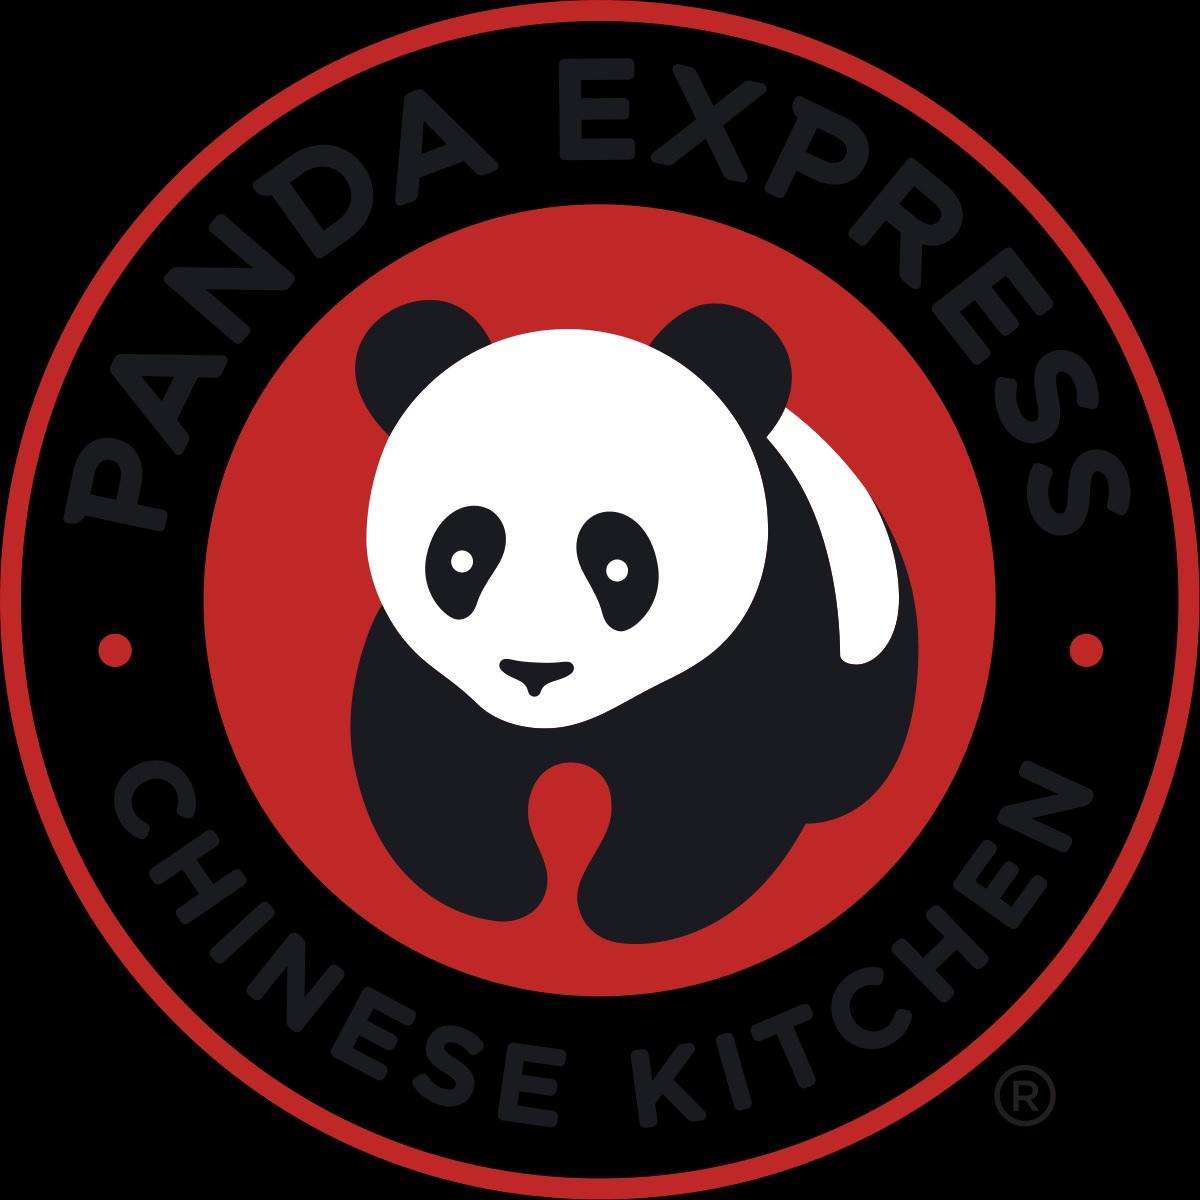 Panda Express - Royal Oak